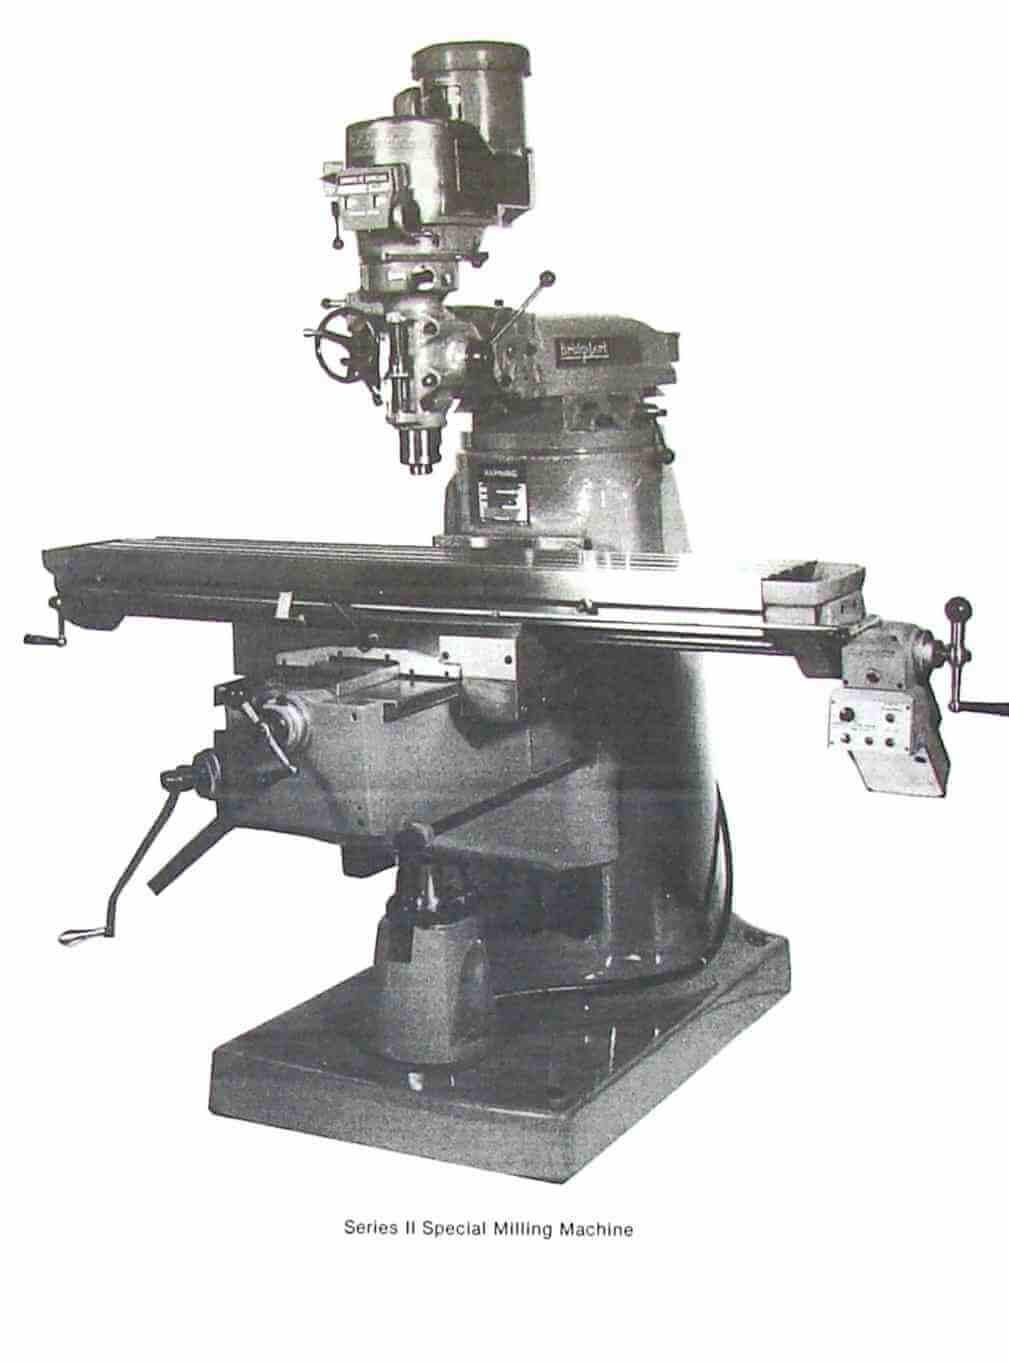 Electrical Wiring Diagram For Bridgeport Milling Machine : Bridgeport series ii special milling machine instructions